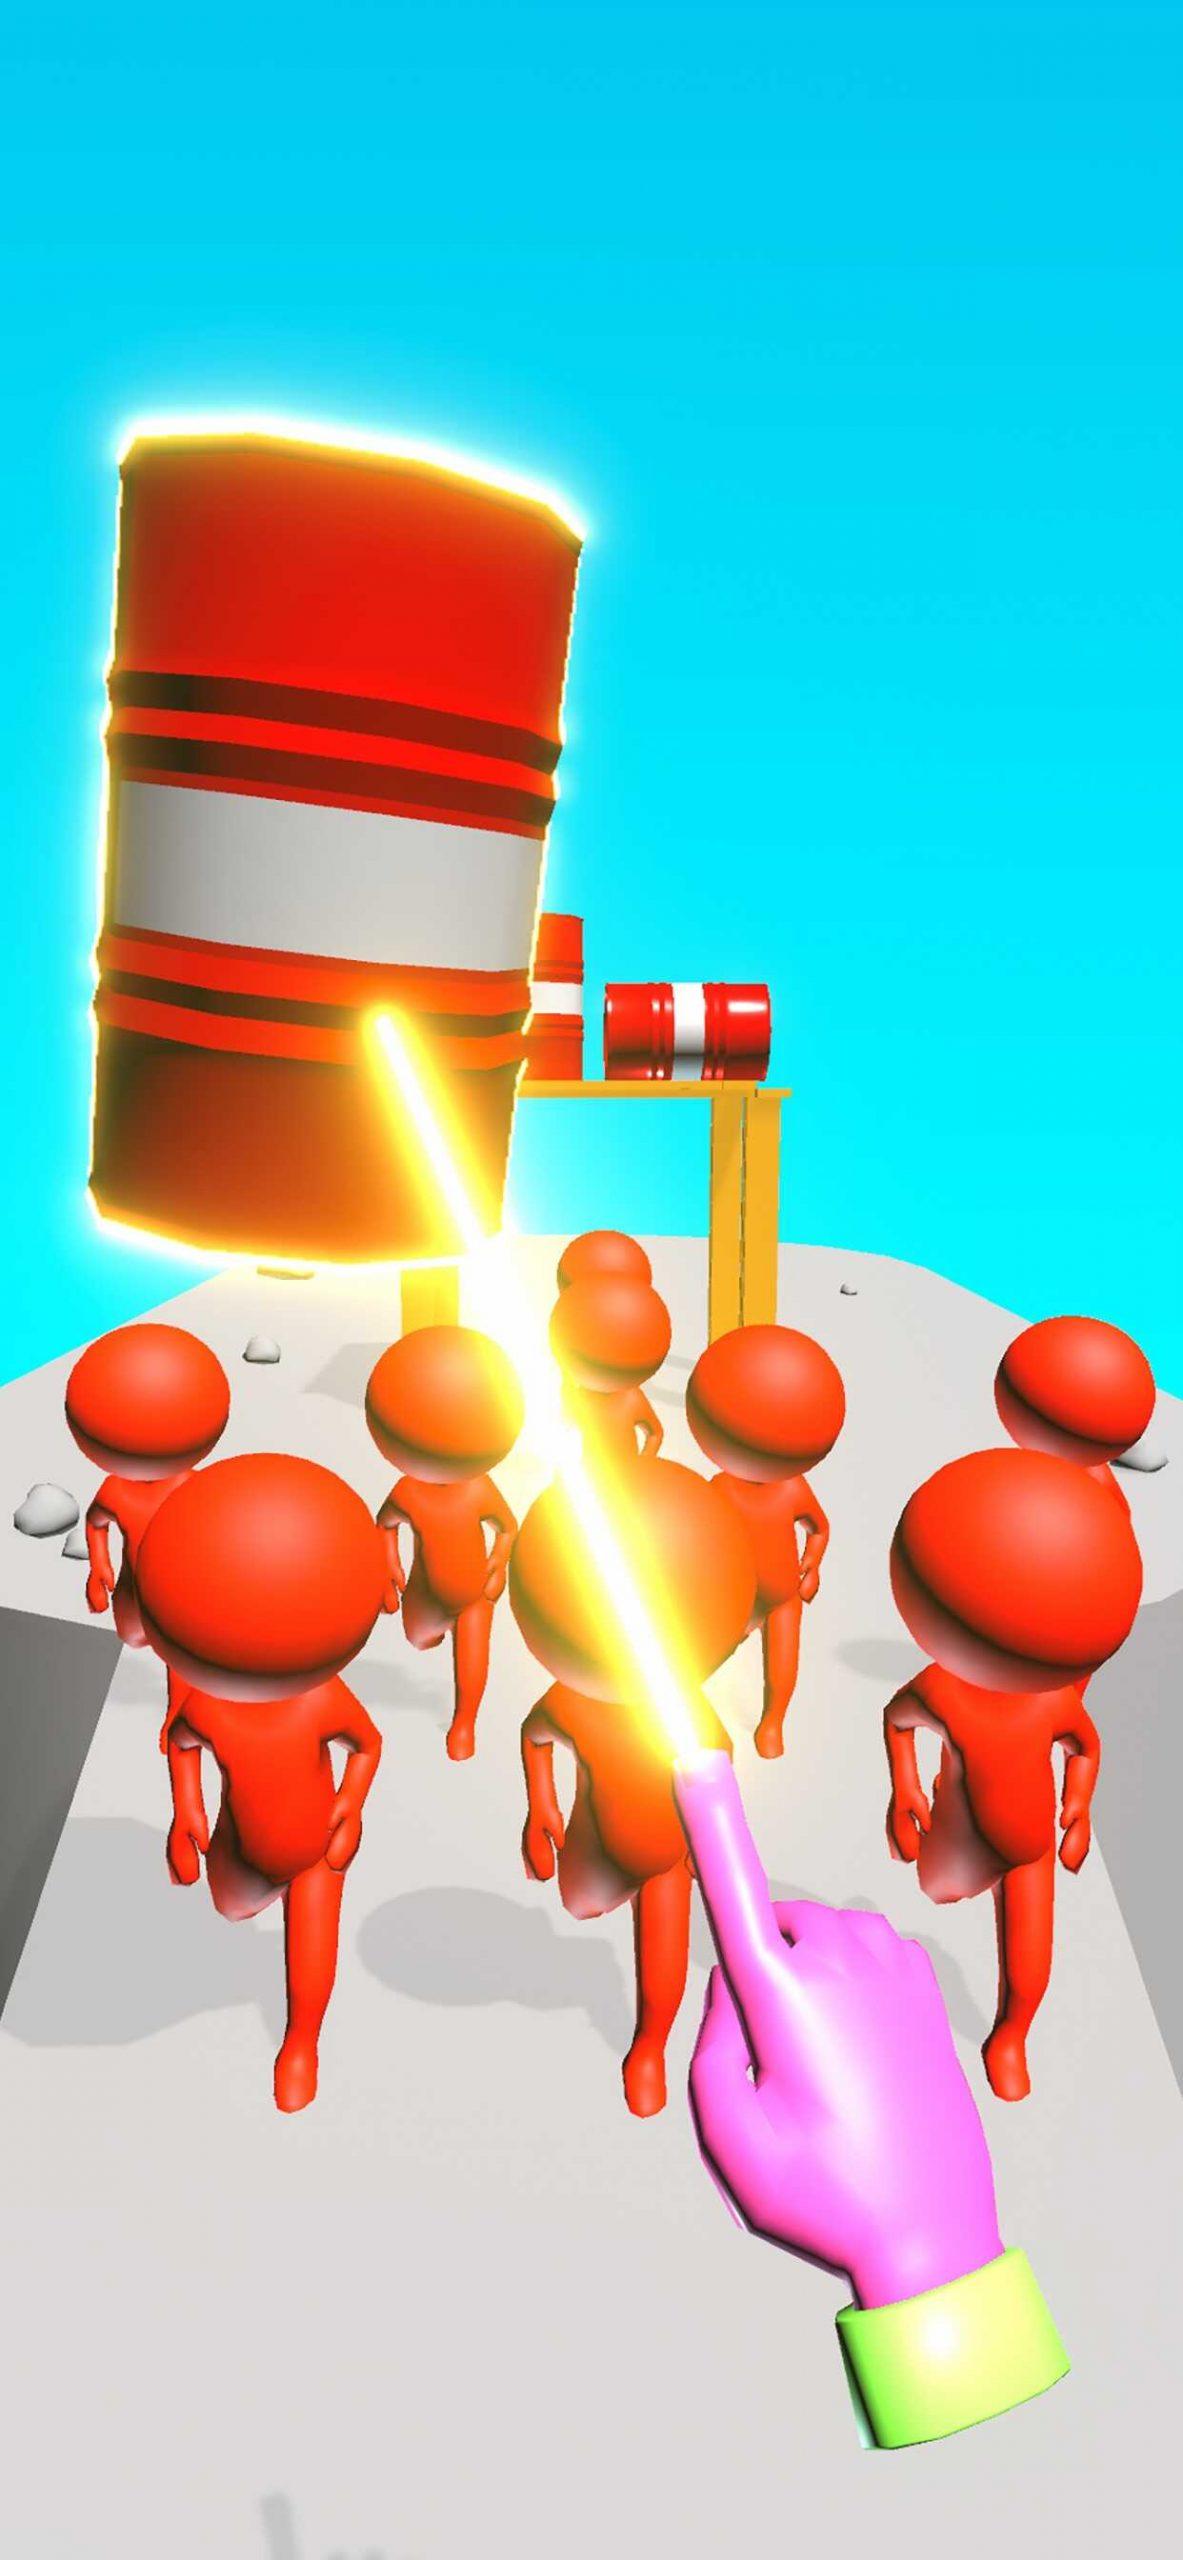 Magic Finger 3D(マジックフィンガー3D)のレビュー